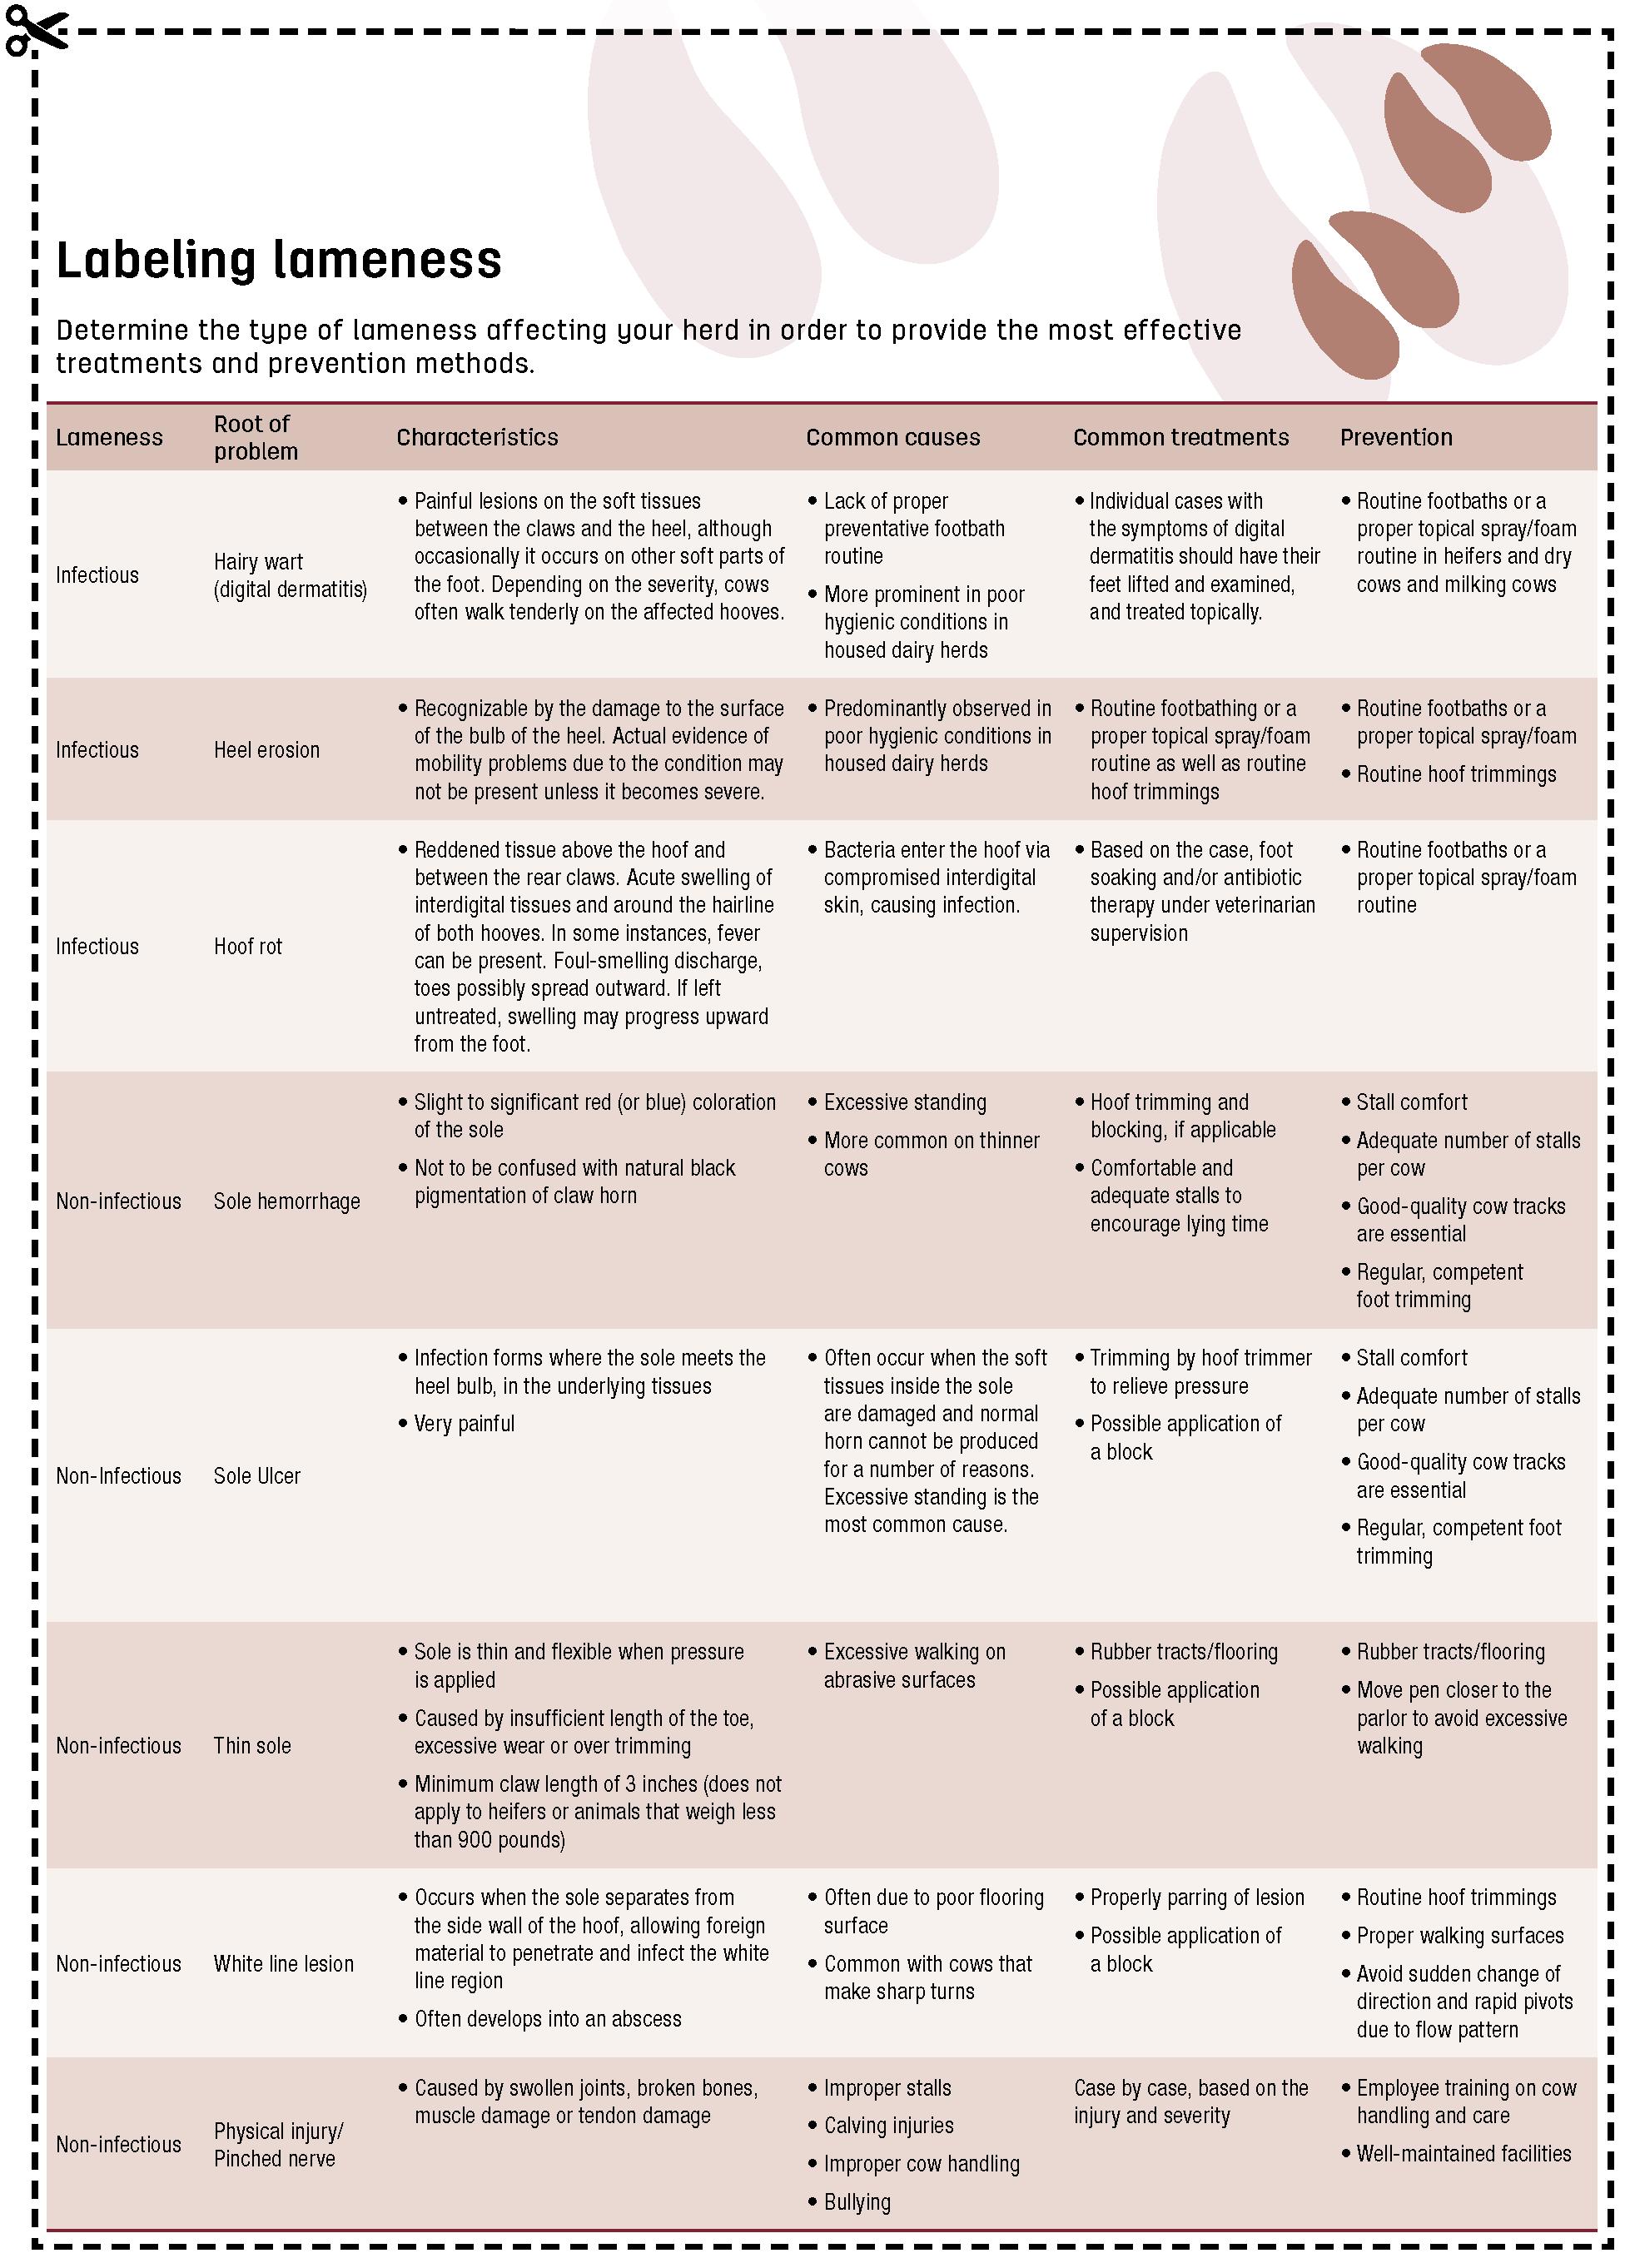 1219pd-hendrickson-chart.png